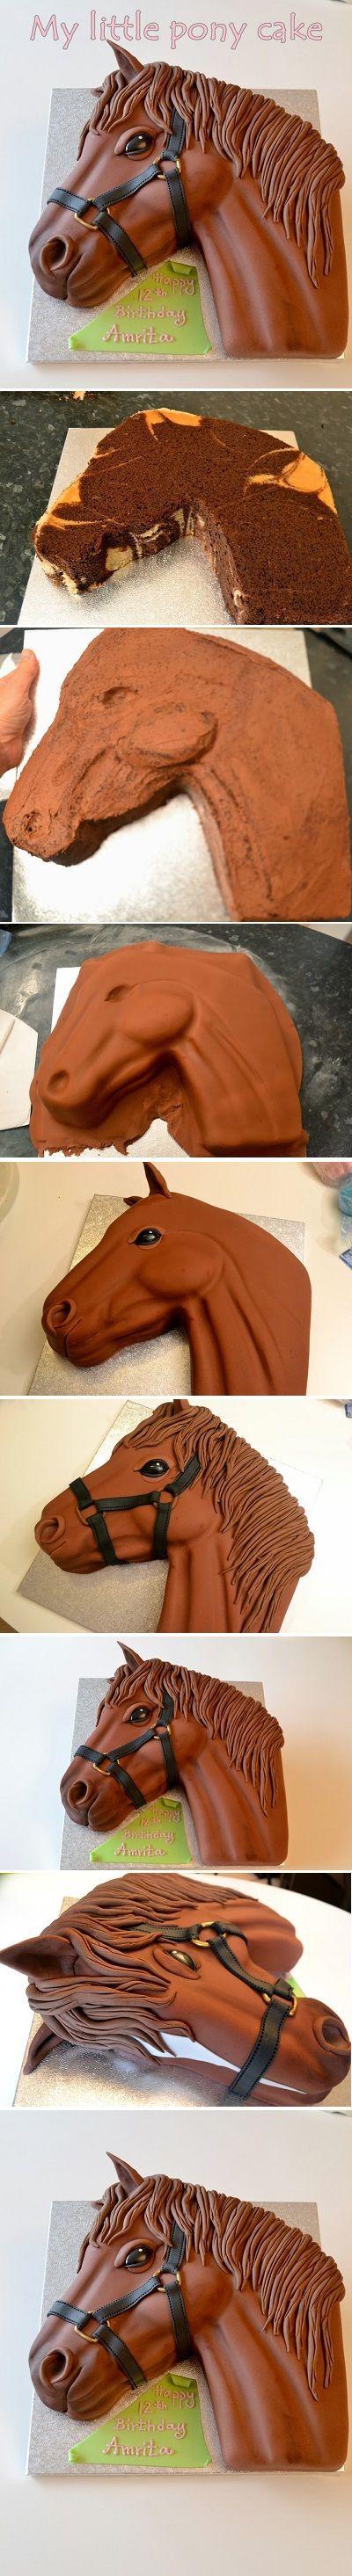 Horse cake ( I would feel bad cutting it)